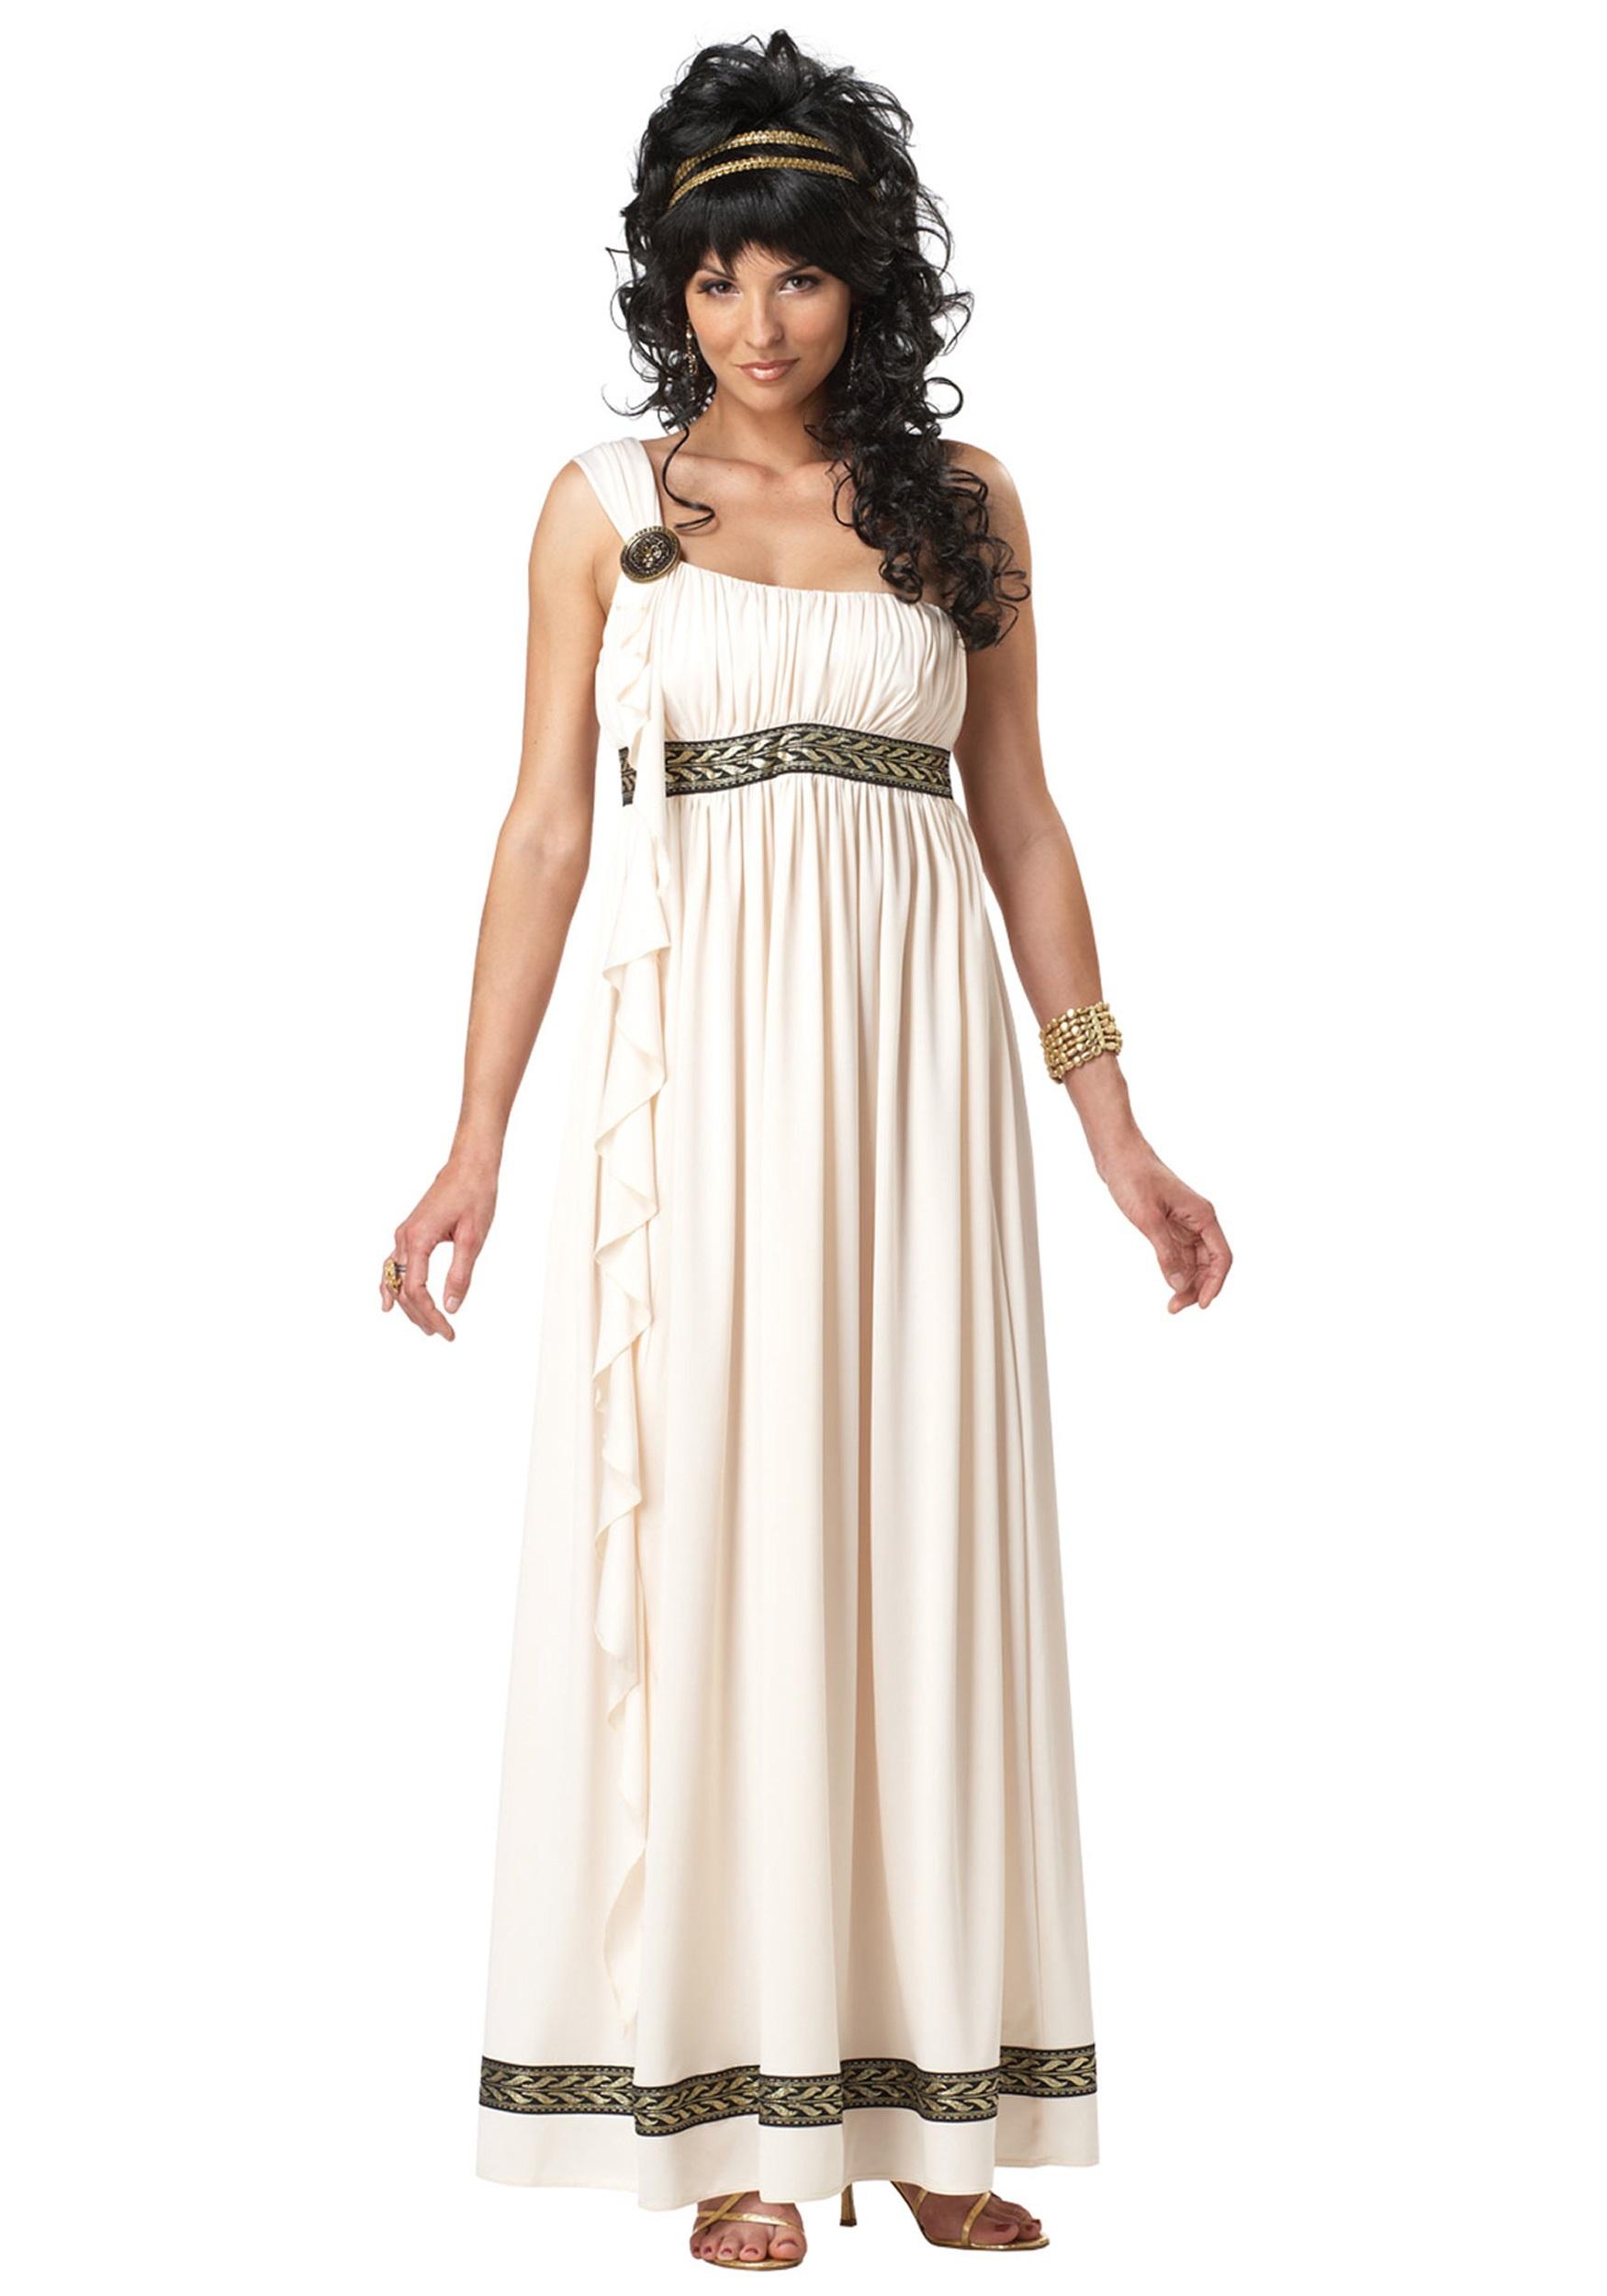 Olympic Goddess Women's Costume